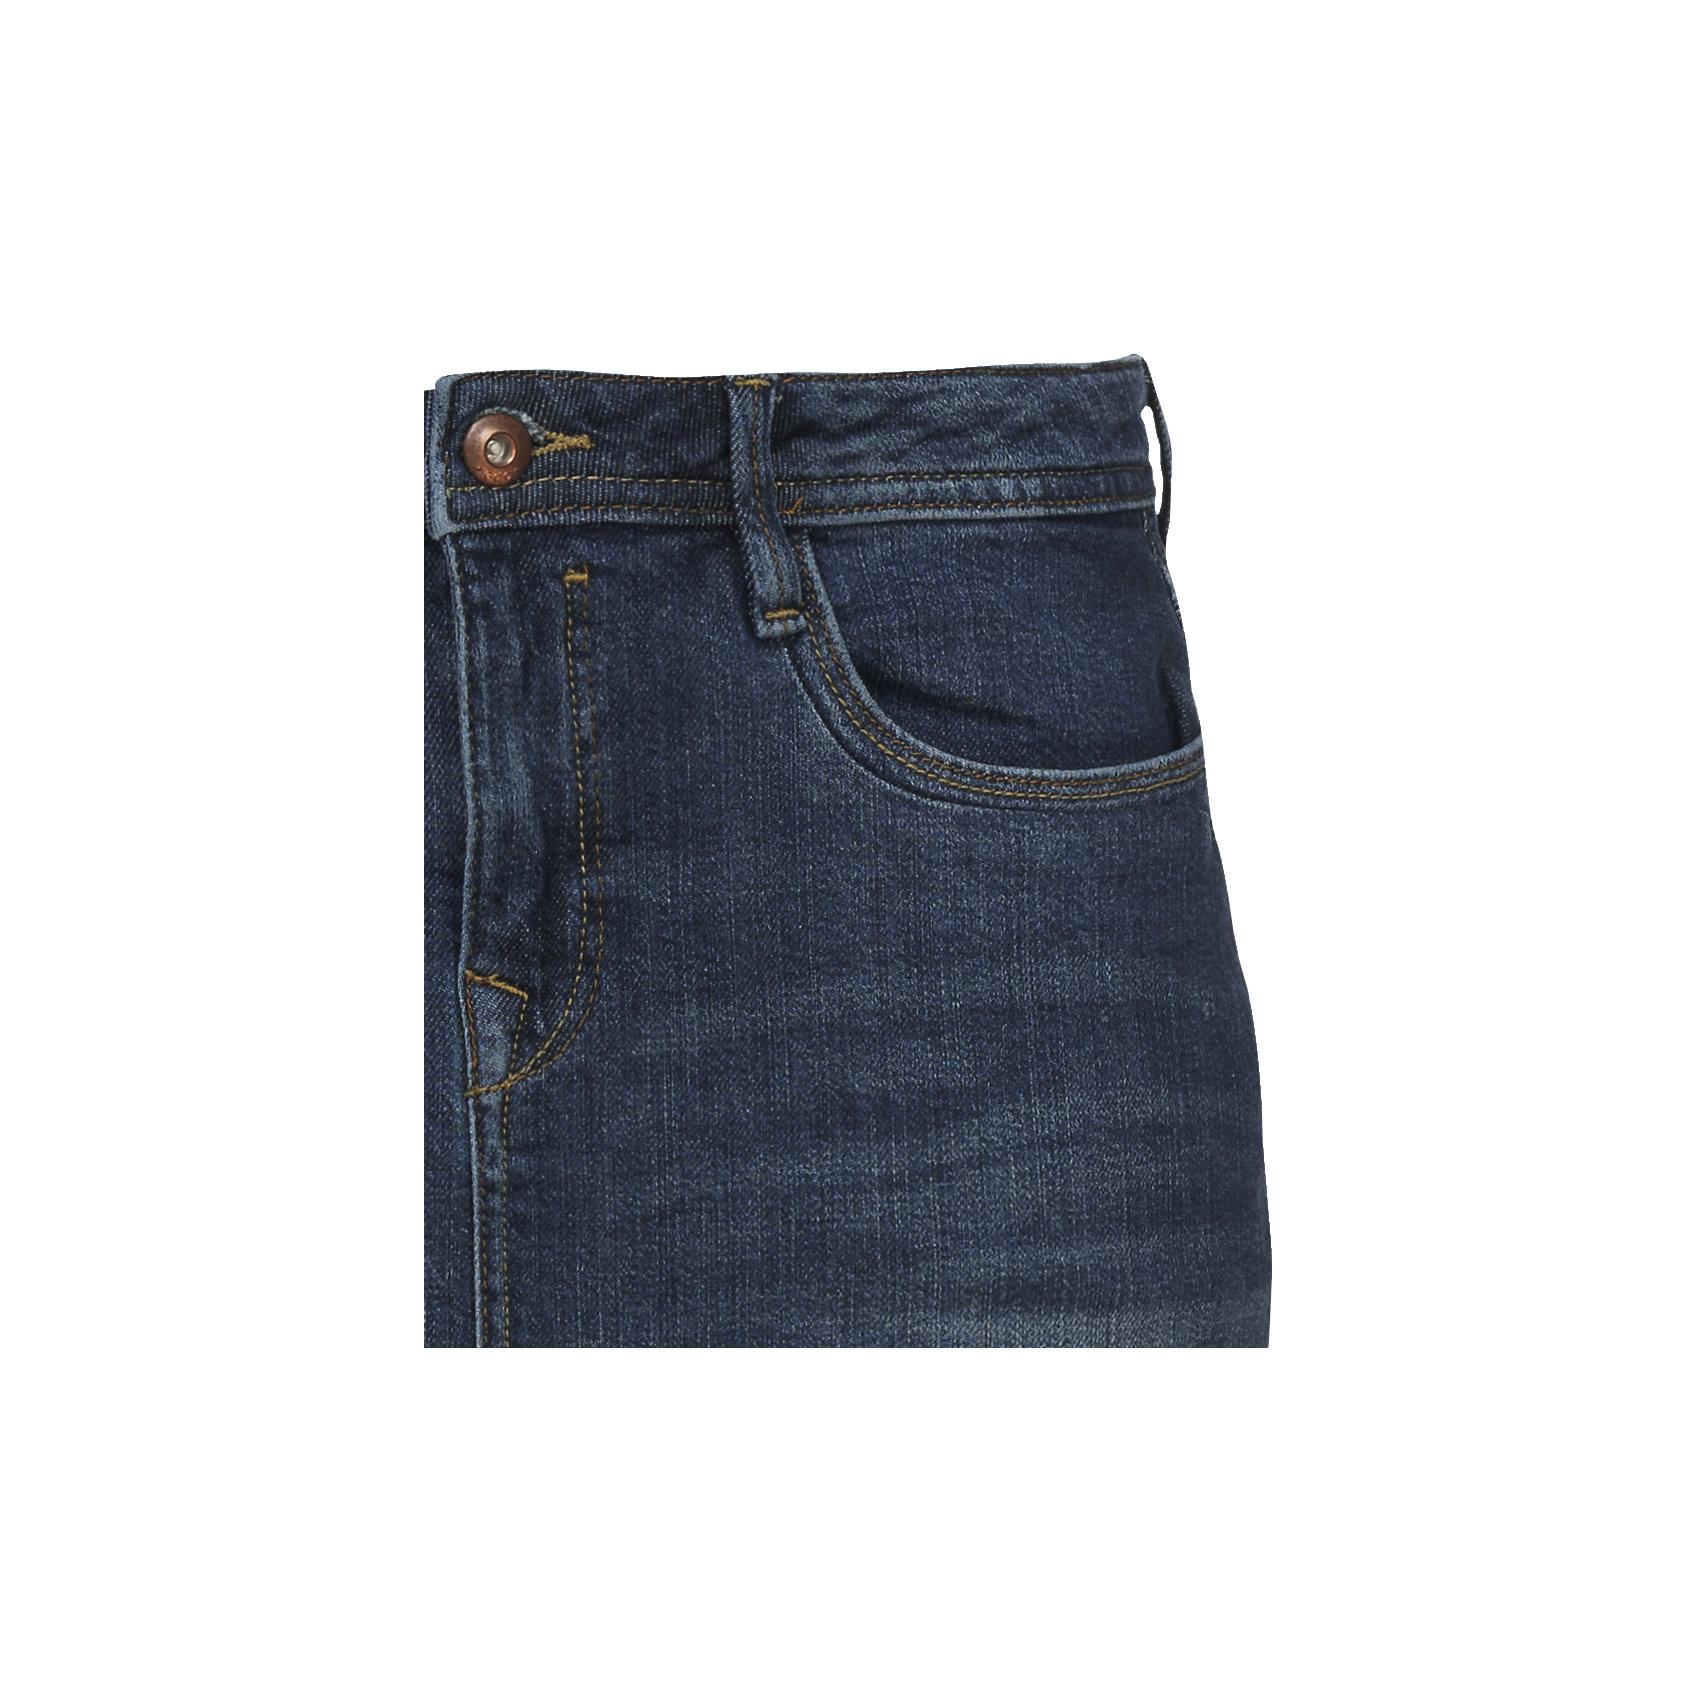 Neu-edc-by-ESPRIT-Rock-blue-denim-6041322